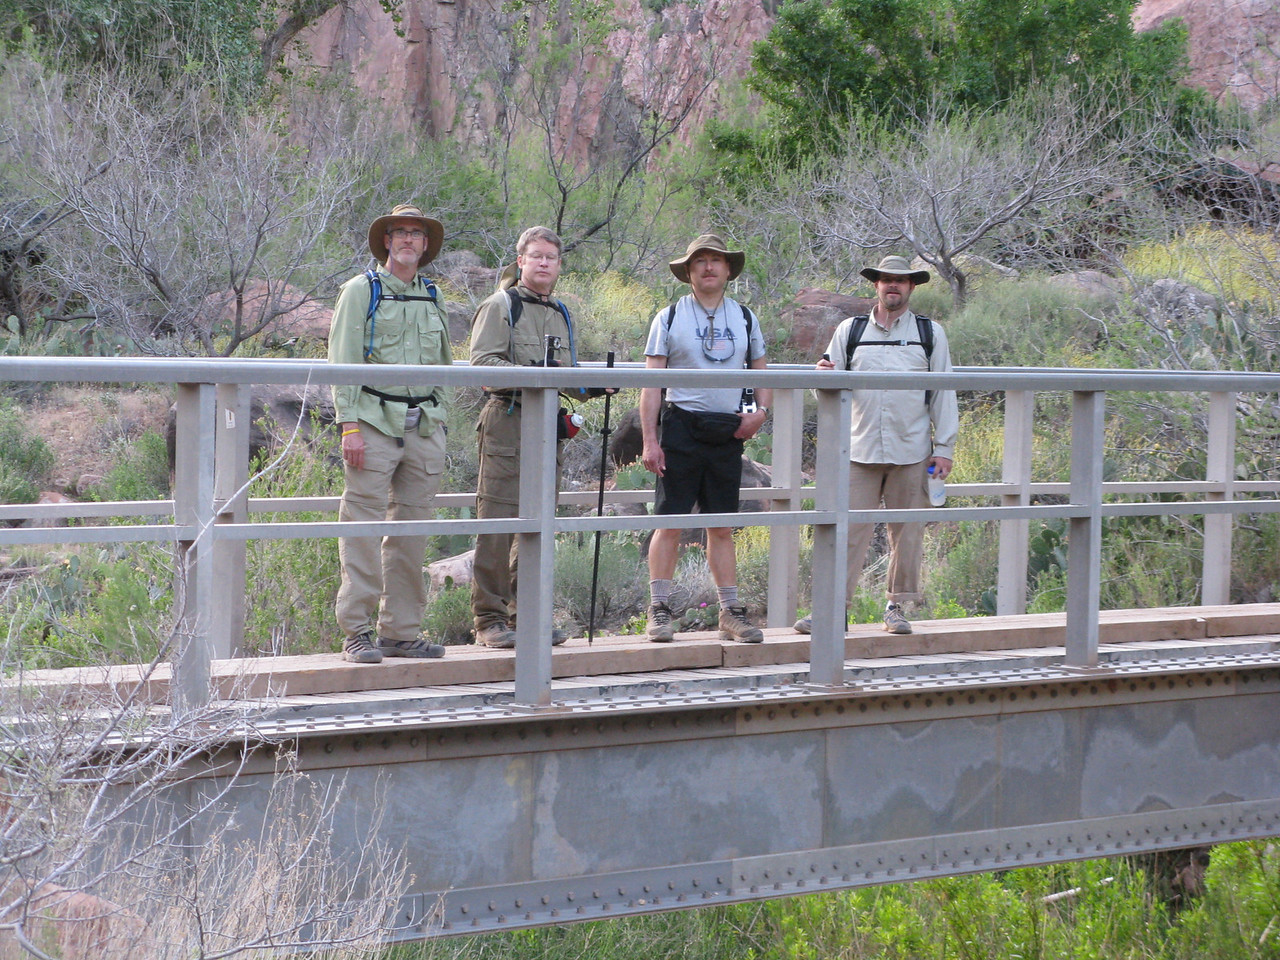 We crossed the lower bridge over Bright Angel Creek on the way to the Silver Bridge. (L to R) Glenn, Richard, Dariusz and Jeff.